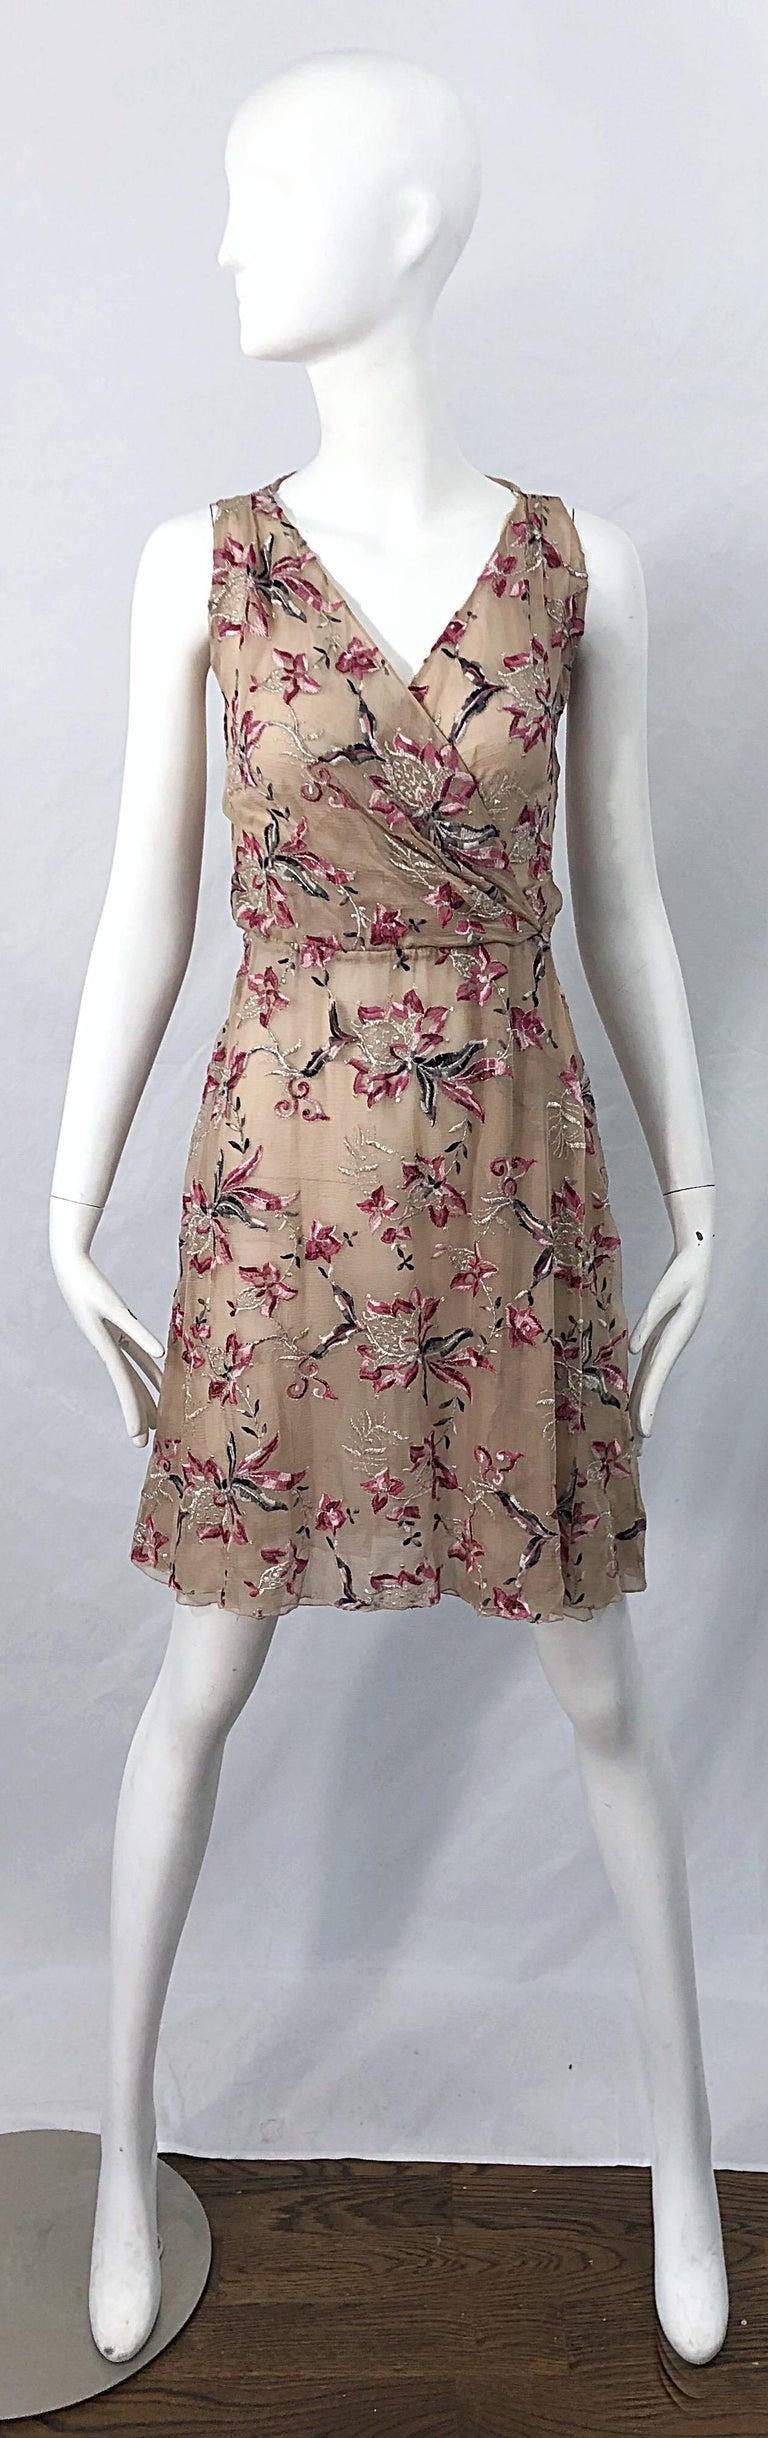 Beautiful 1990s Valentino Nude Silk Chiffon Semi Sheer Size 6 Embroidered Dress For Sale 11